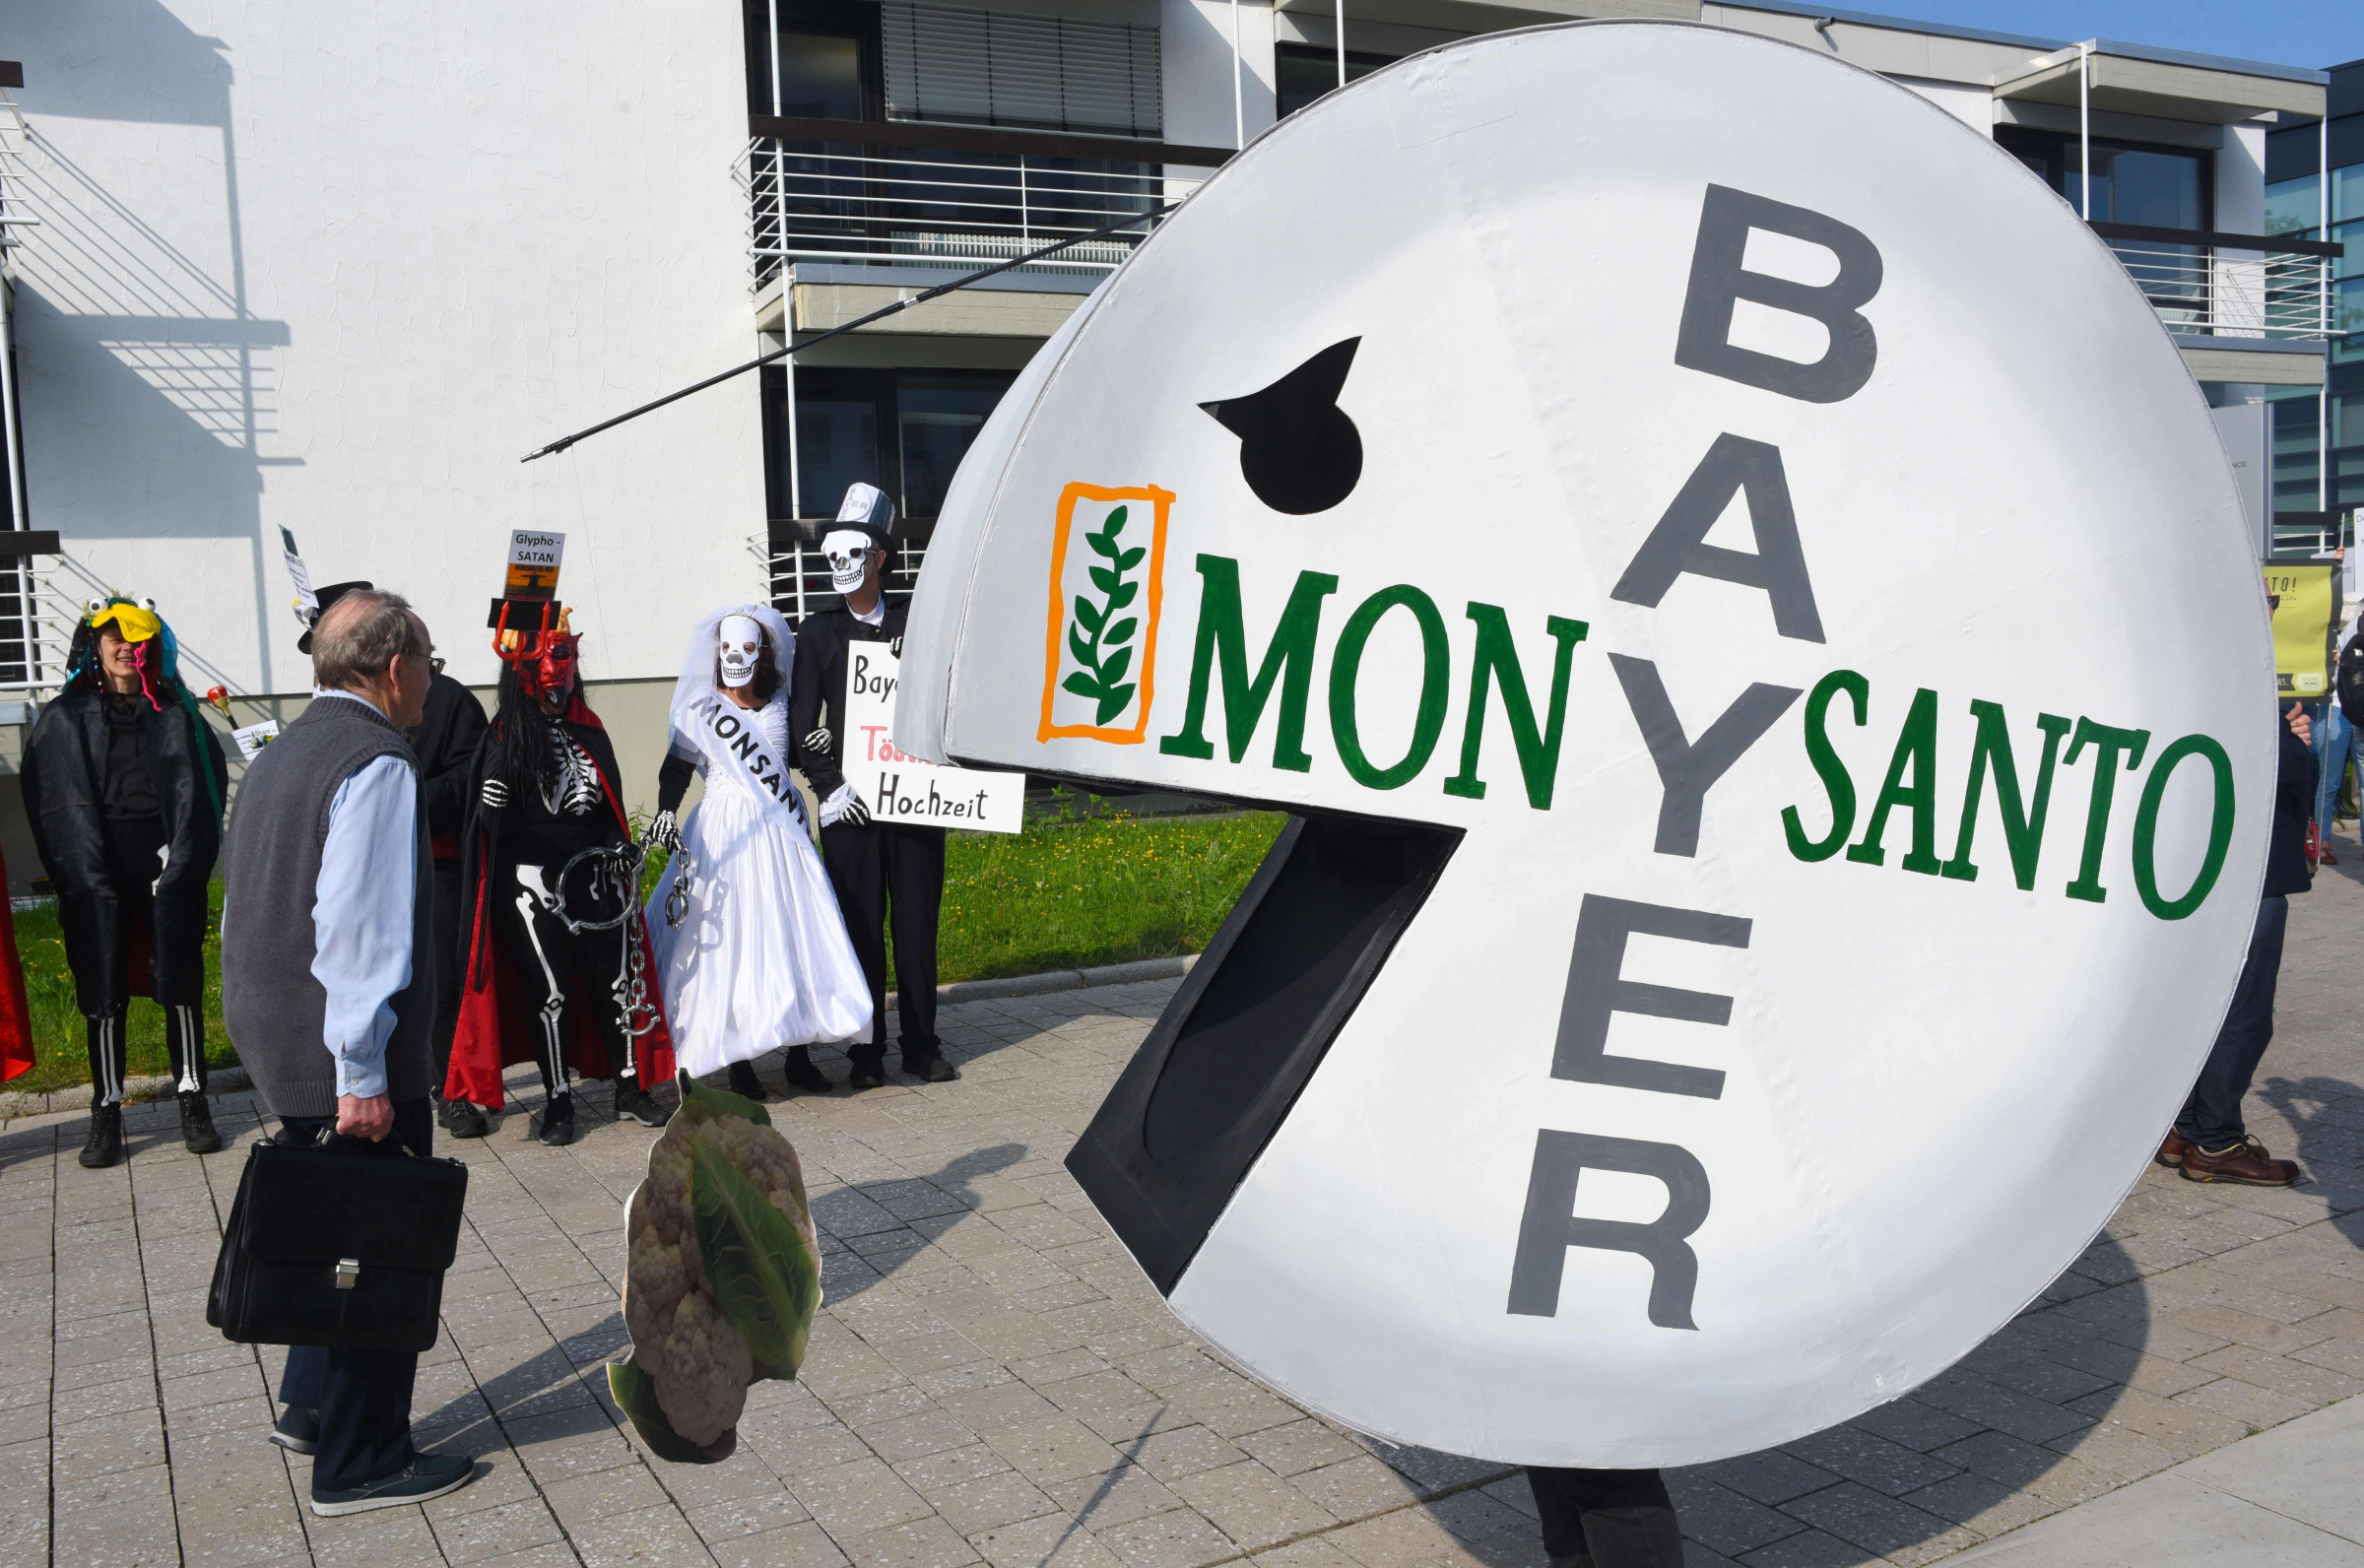 Majandus.ee: Monsanto Bayer liitumine Foto: AFP PHOTO / Patrik STOLLARZ